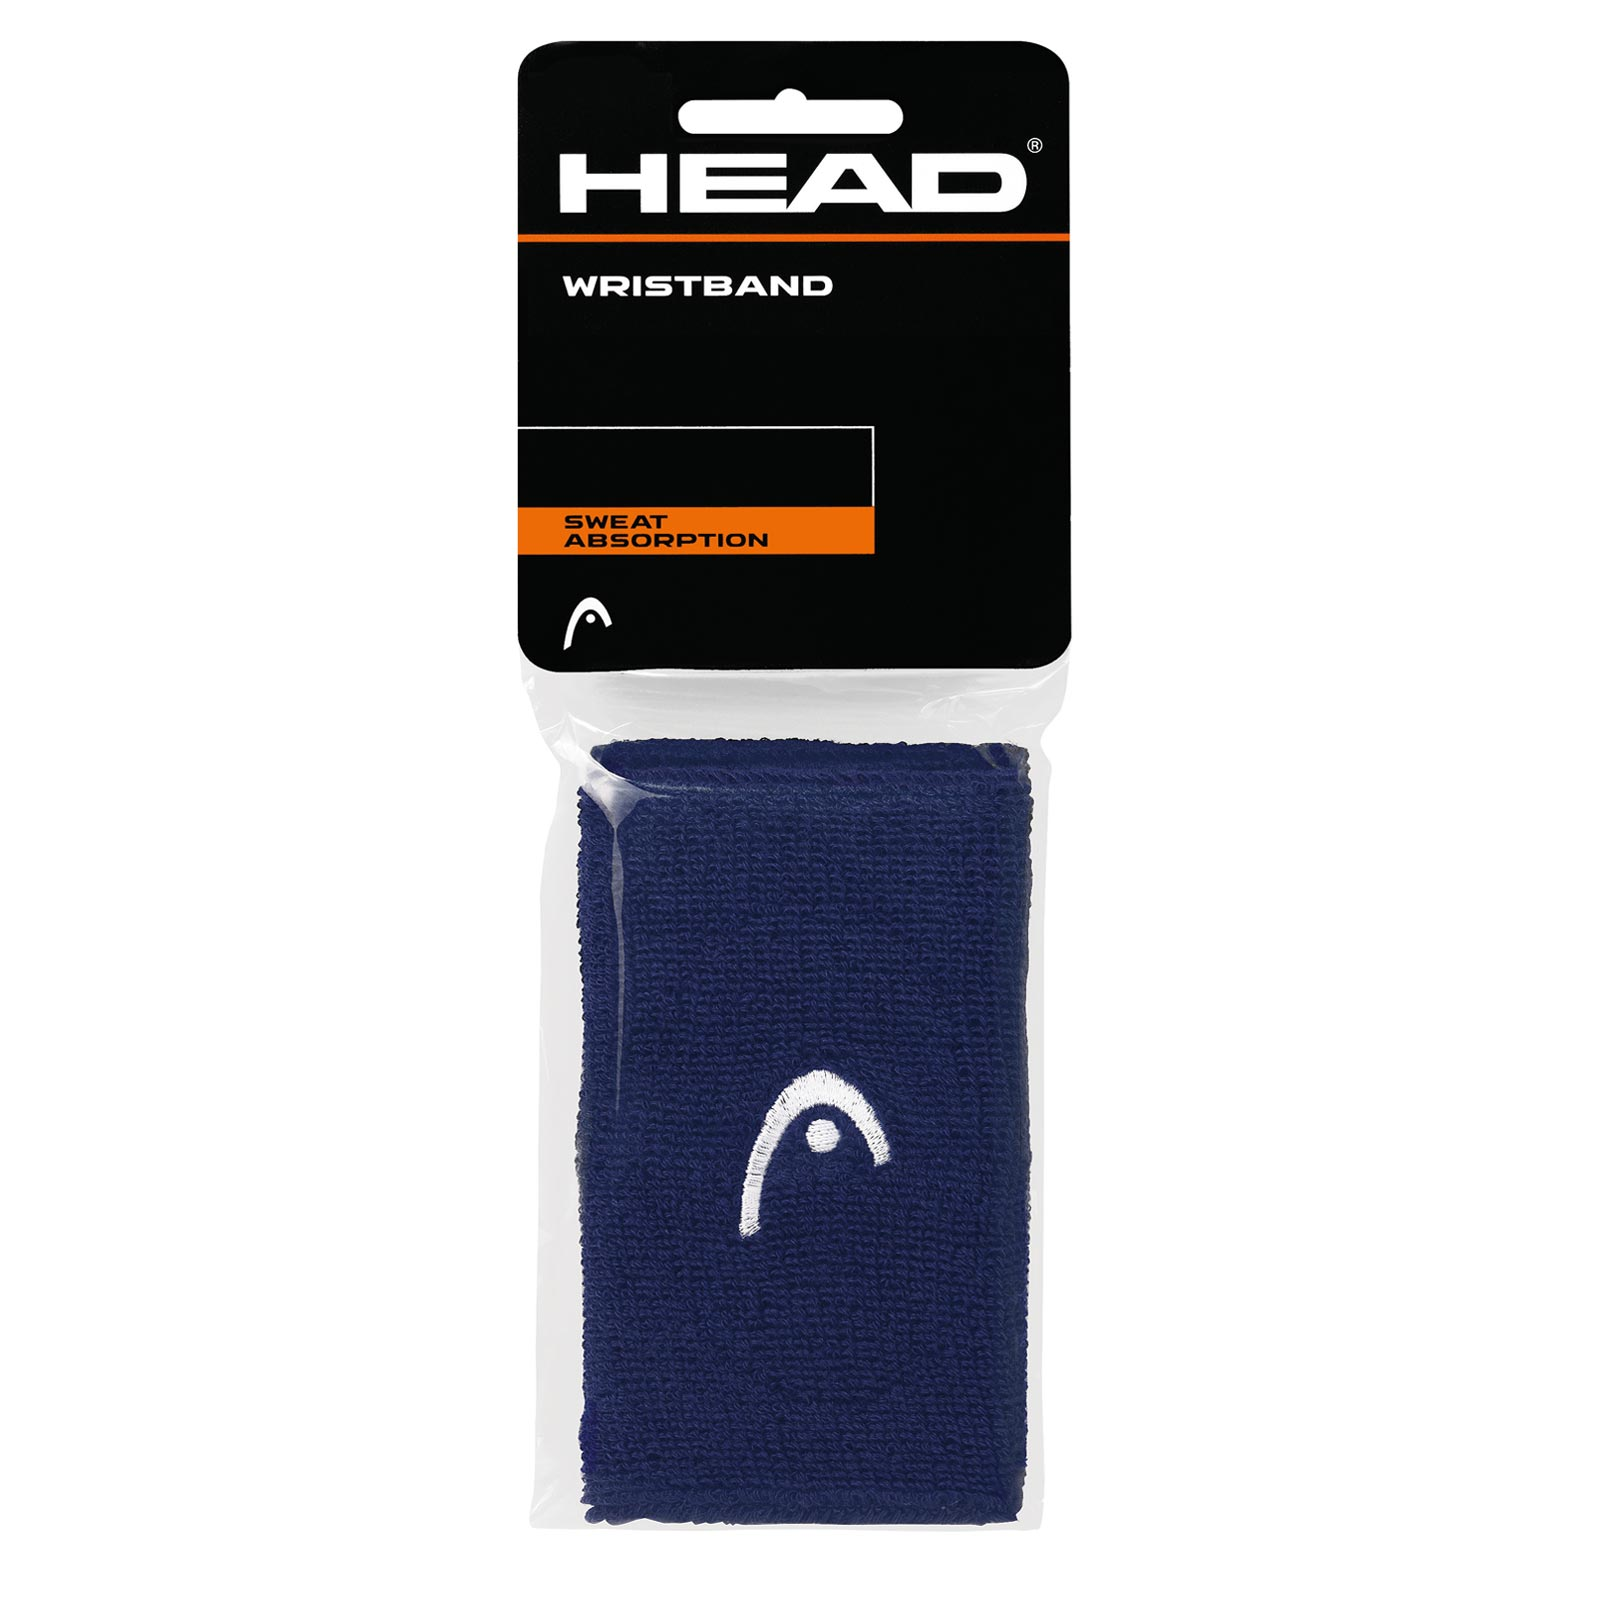 "HEAD Wristband 5"" 2016 navy"